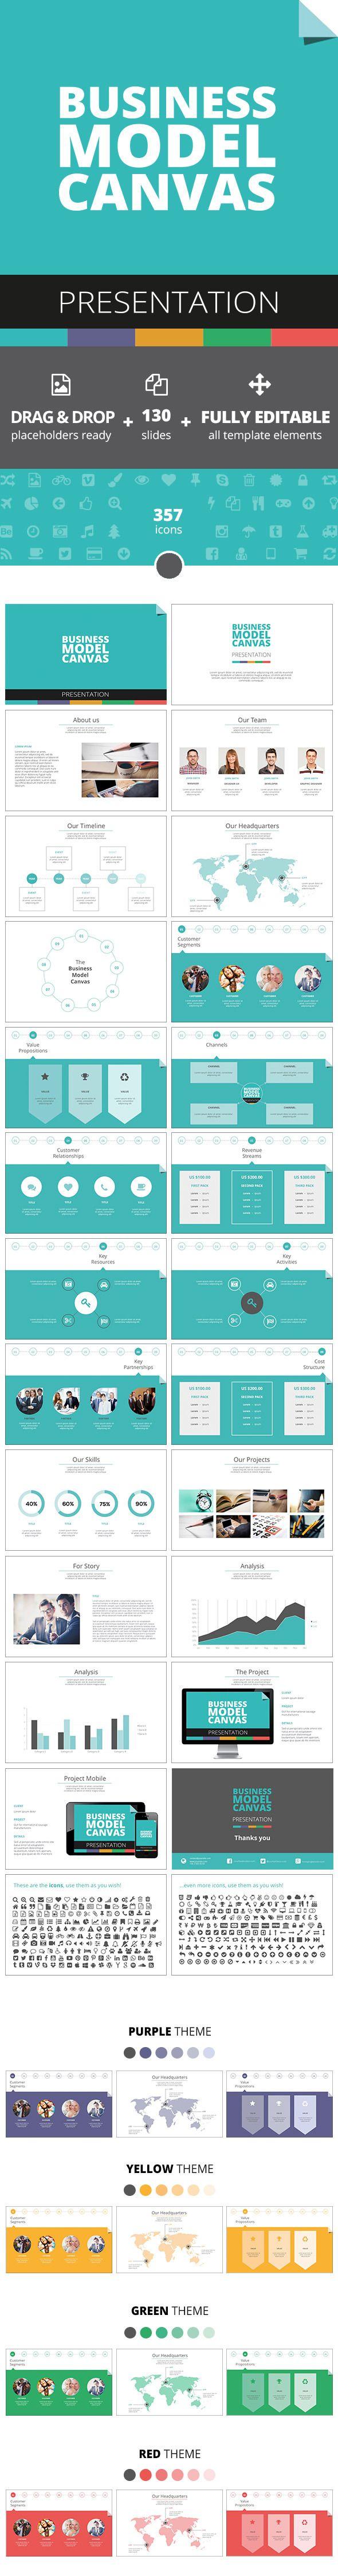 Business Model Canvas Presentation Download http